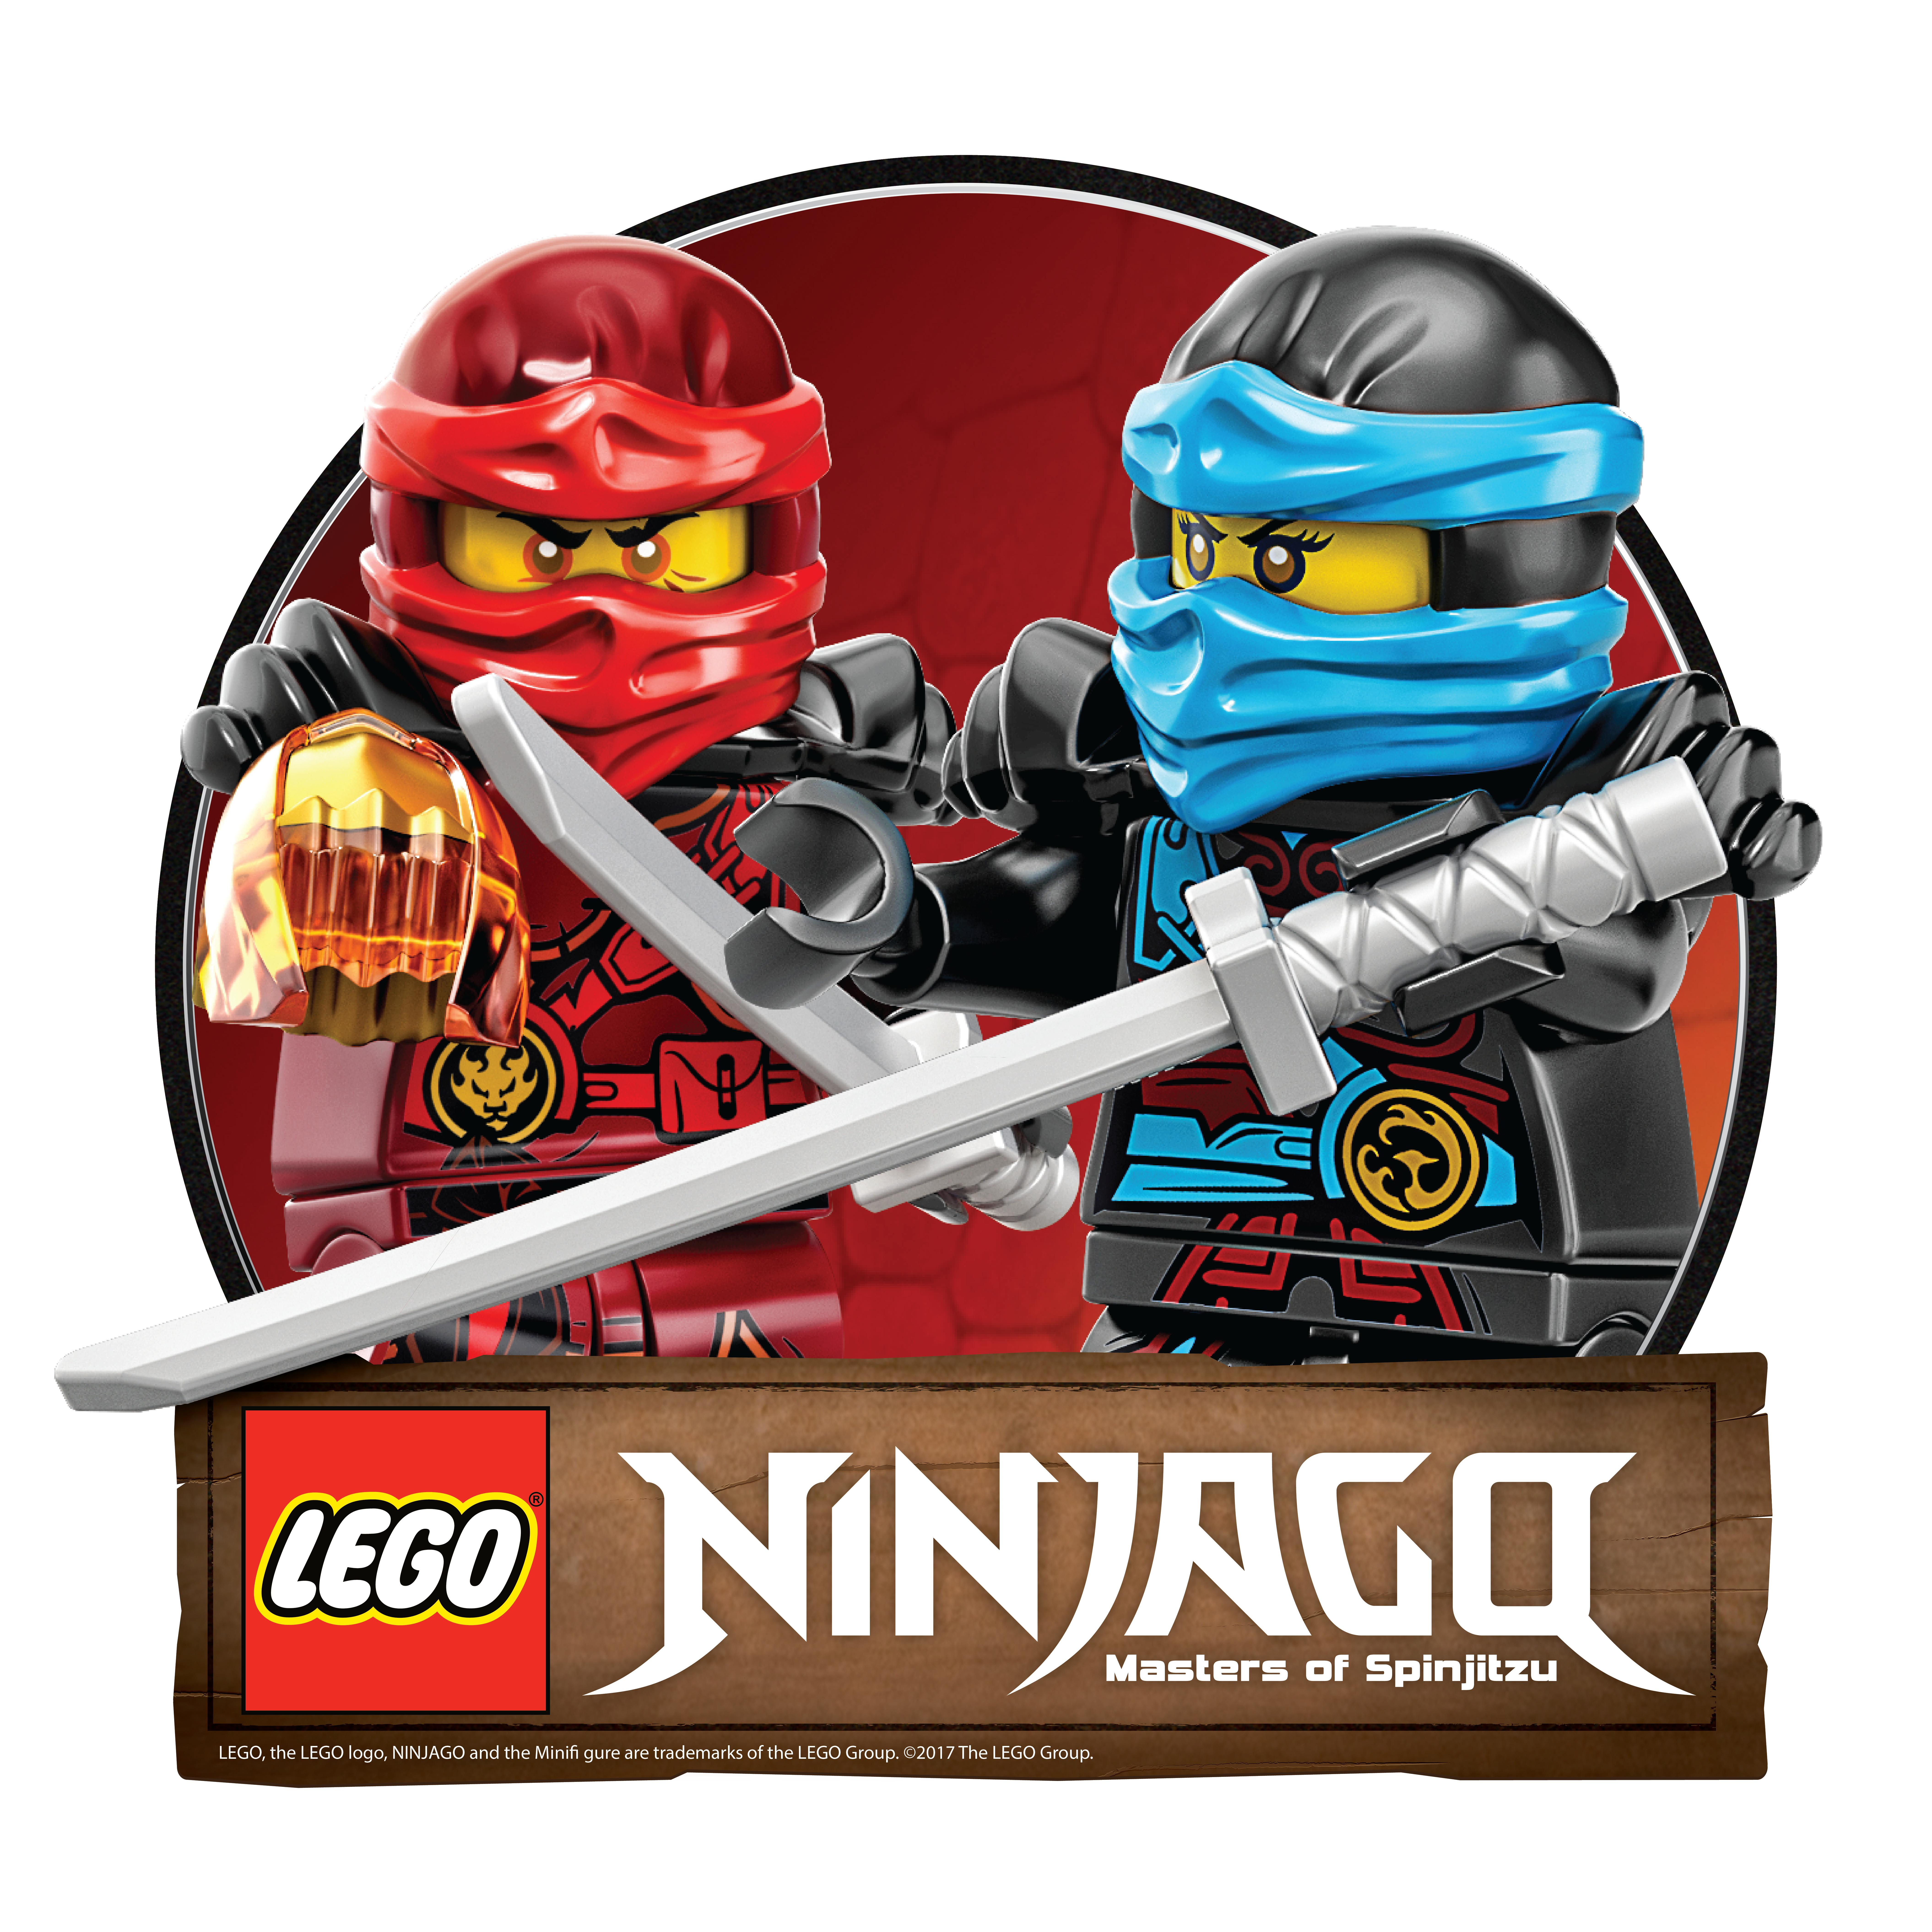 Lego ninjago immersive zone westfield whitford city - Lego ninjago logo ...